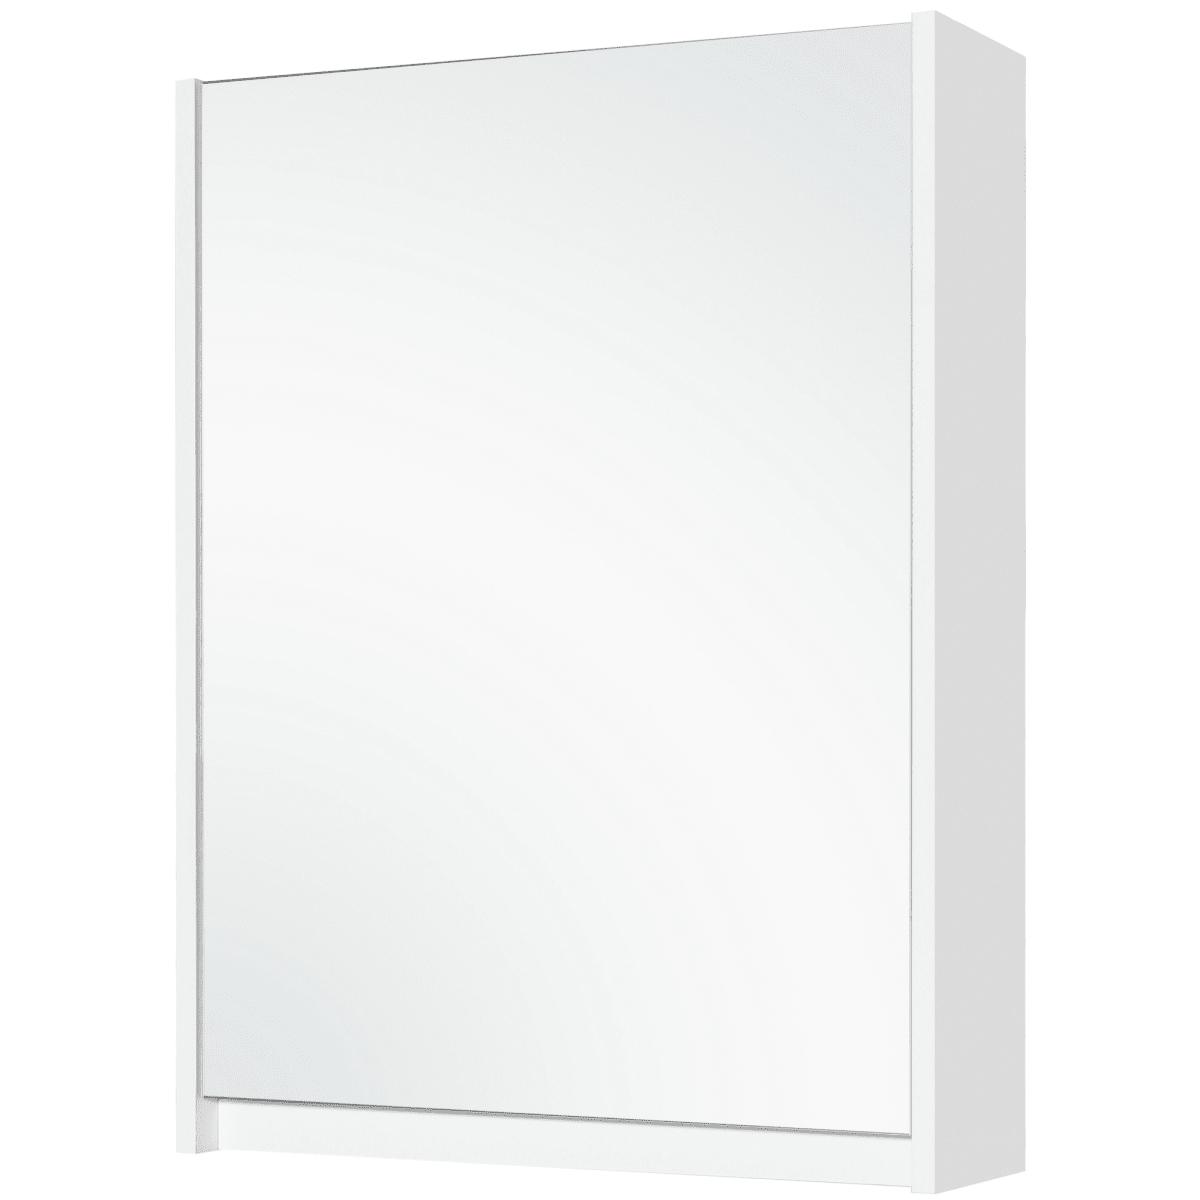 Шкаф зеркальный «Квадро» 60 см цвет белый